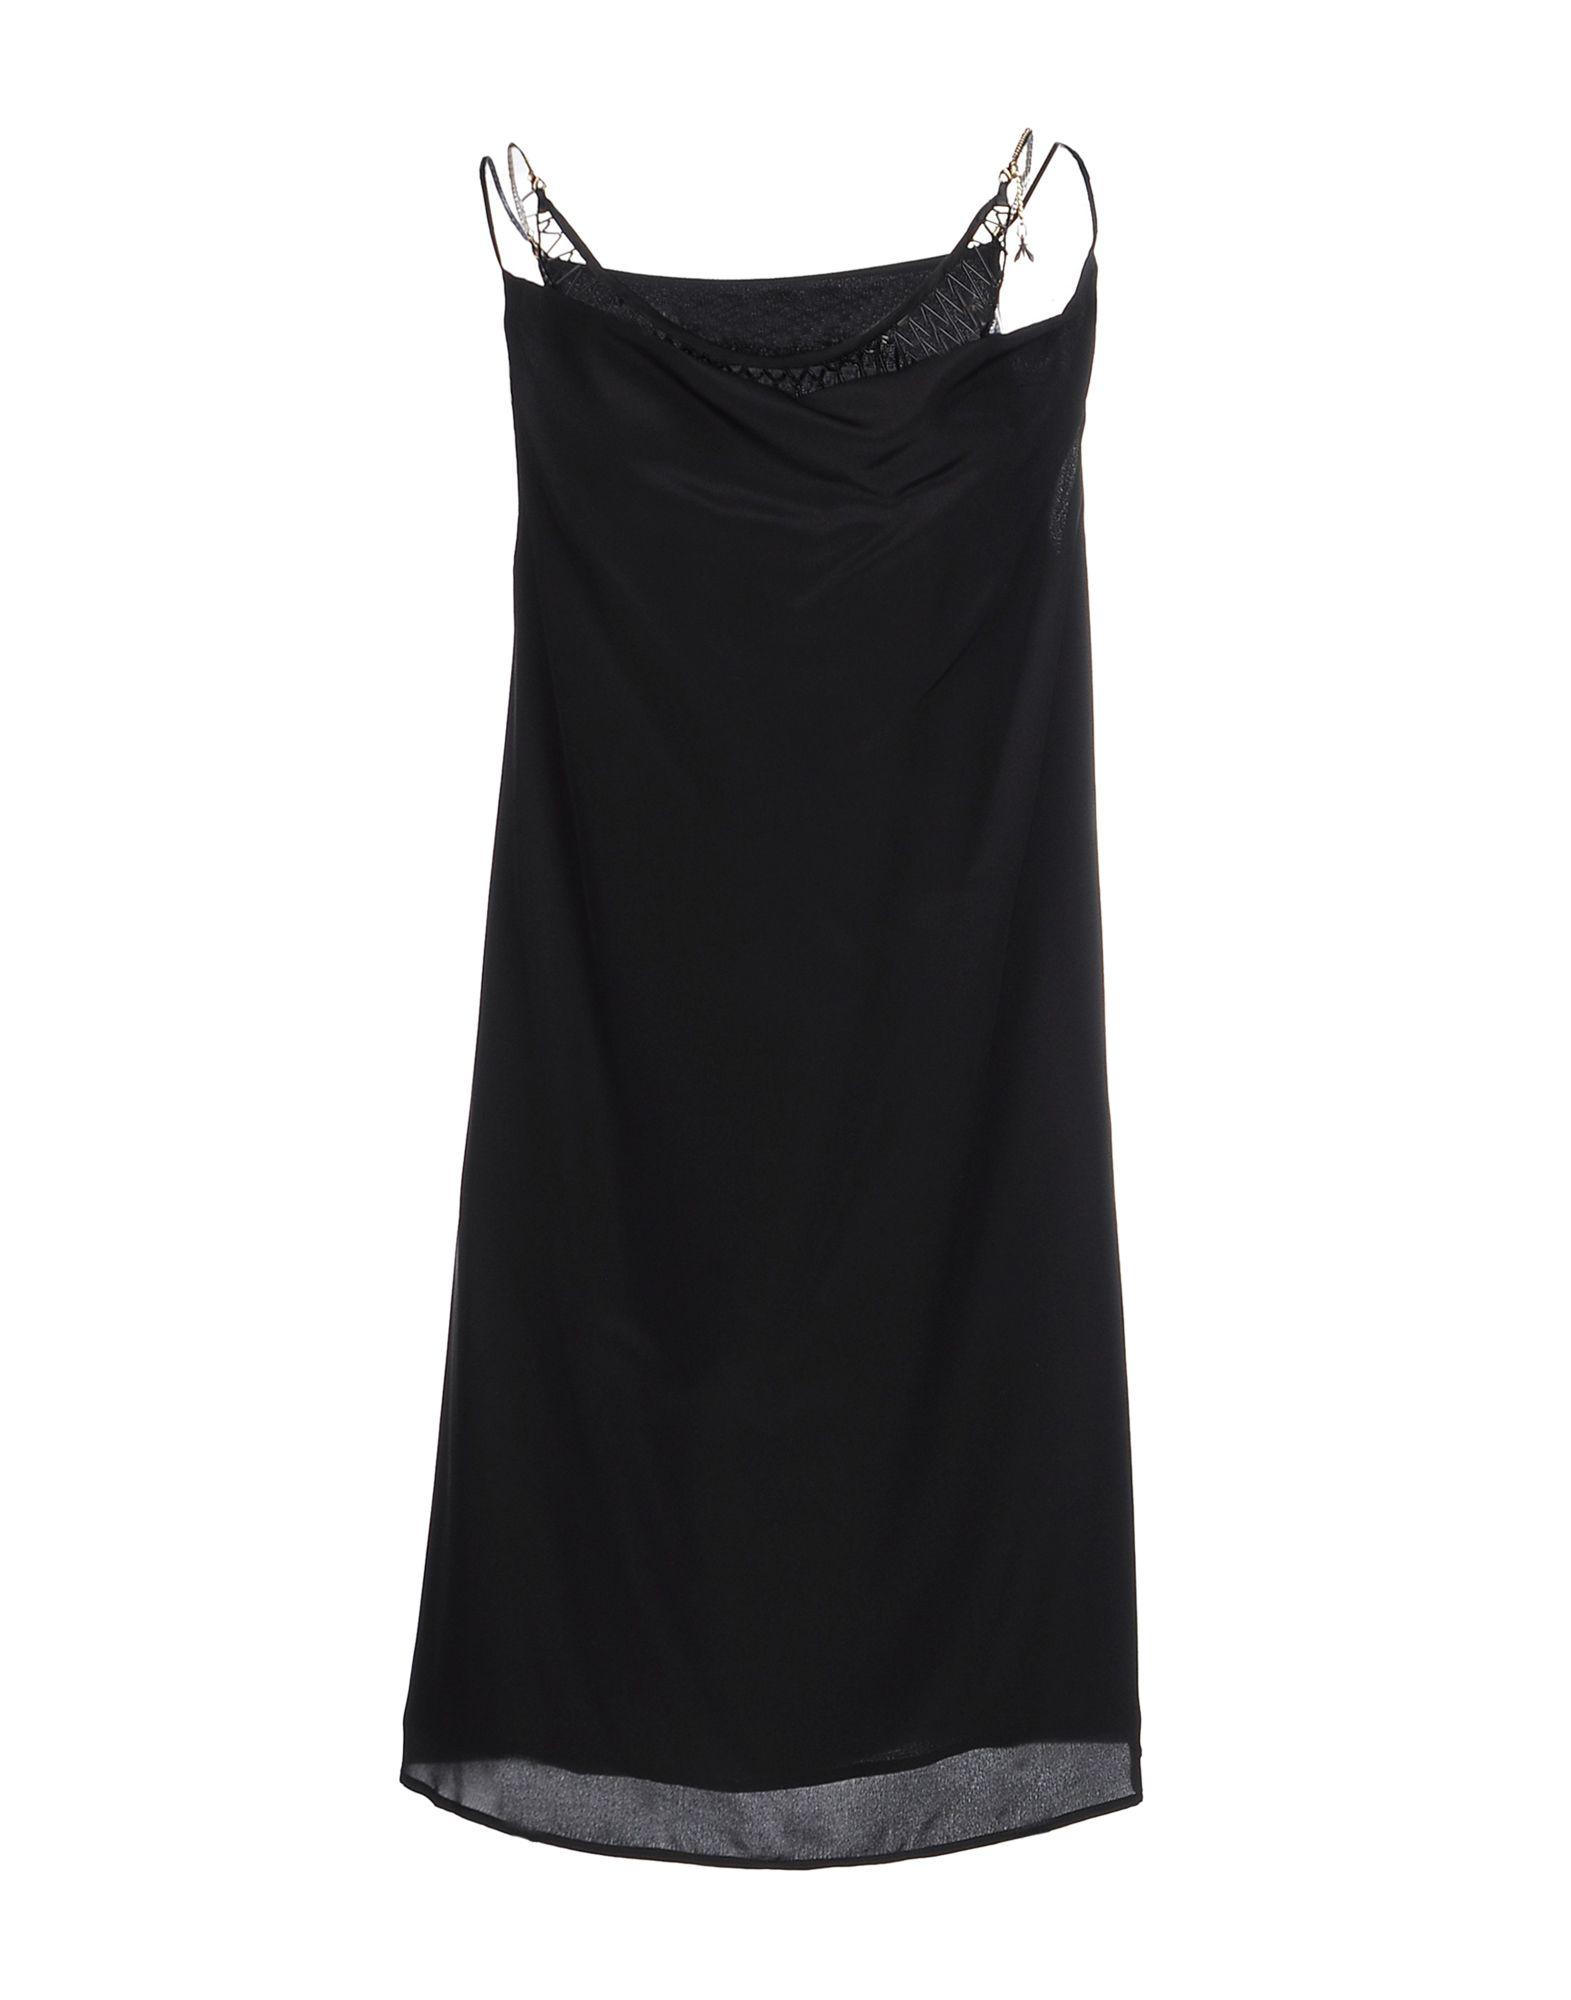 PATRIZIA PEPE SERA Короткое платье patrizia pepe джинсы с 5 карманами с широкими штанинами